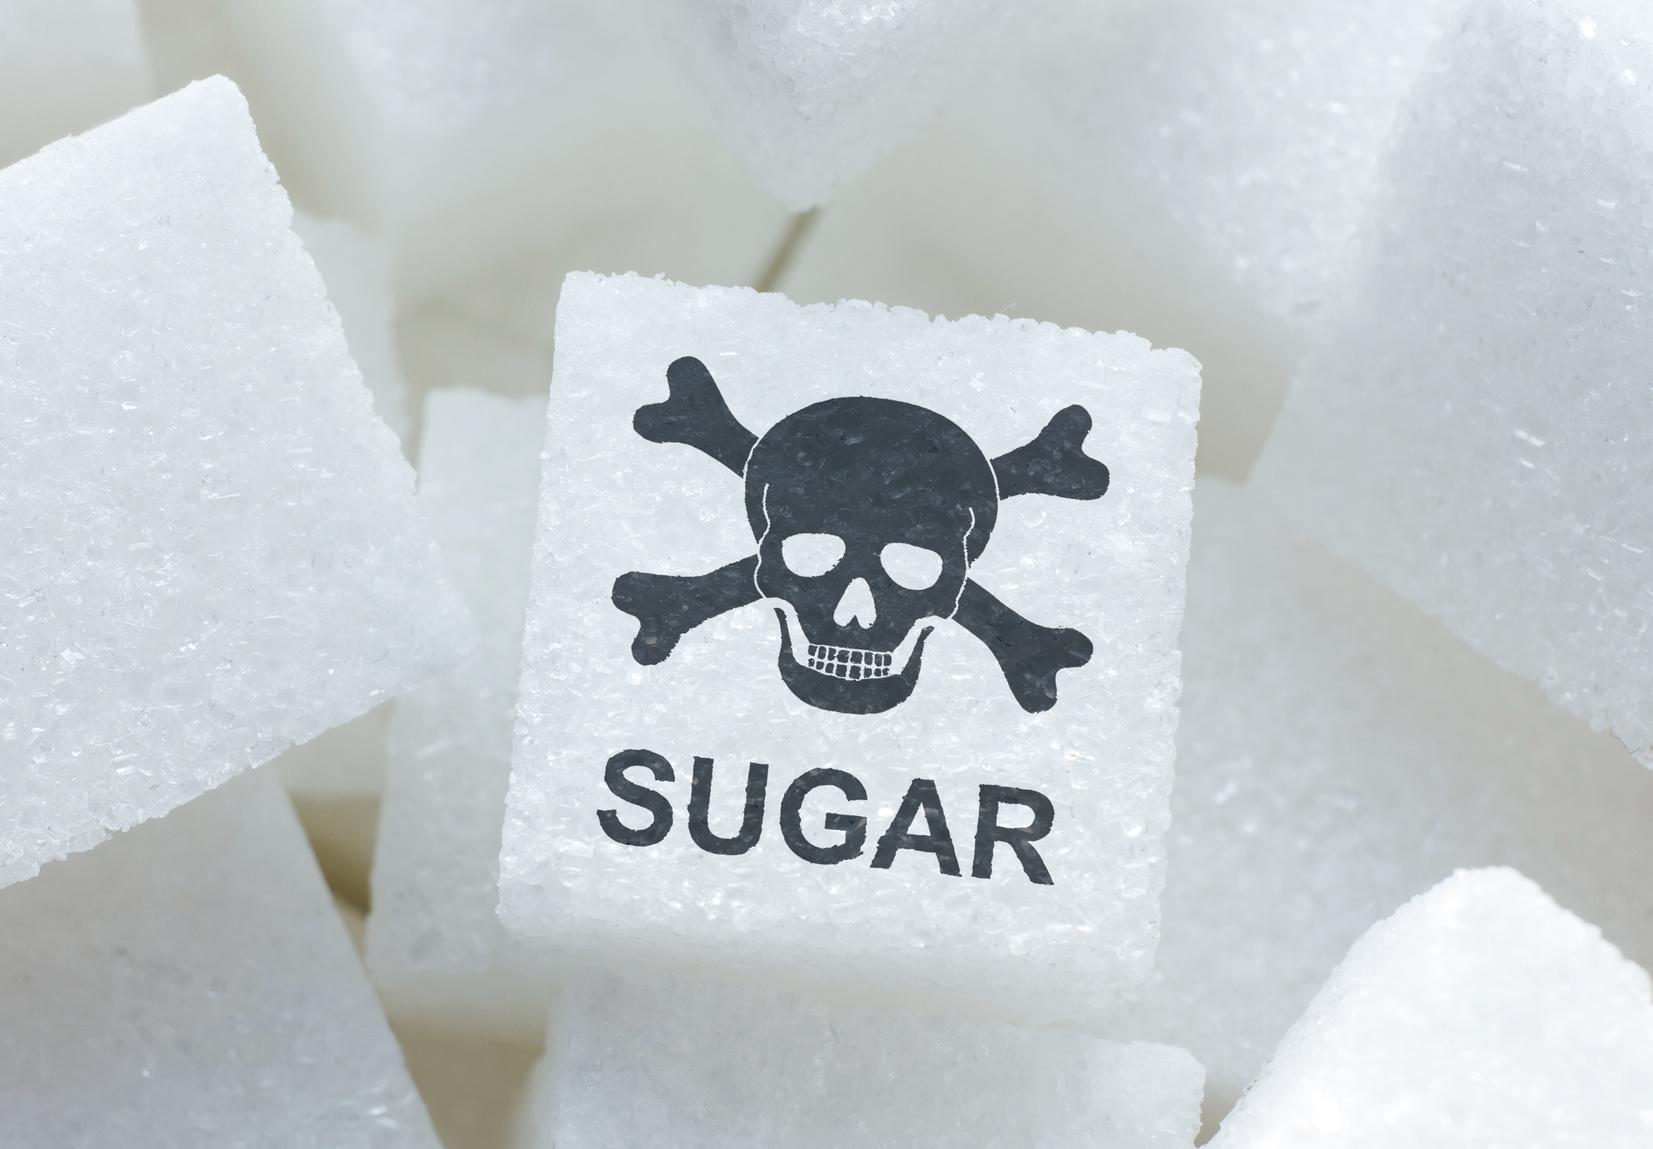 Indoindians Health & Nutrition Talk: Is Sugar Toxic?